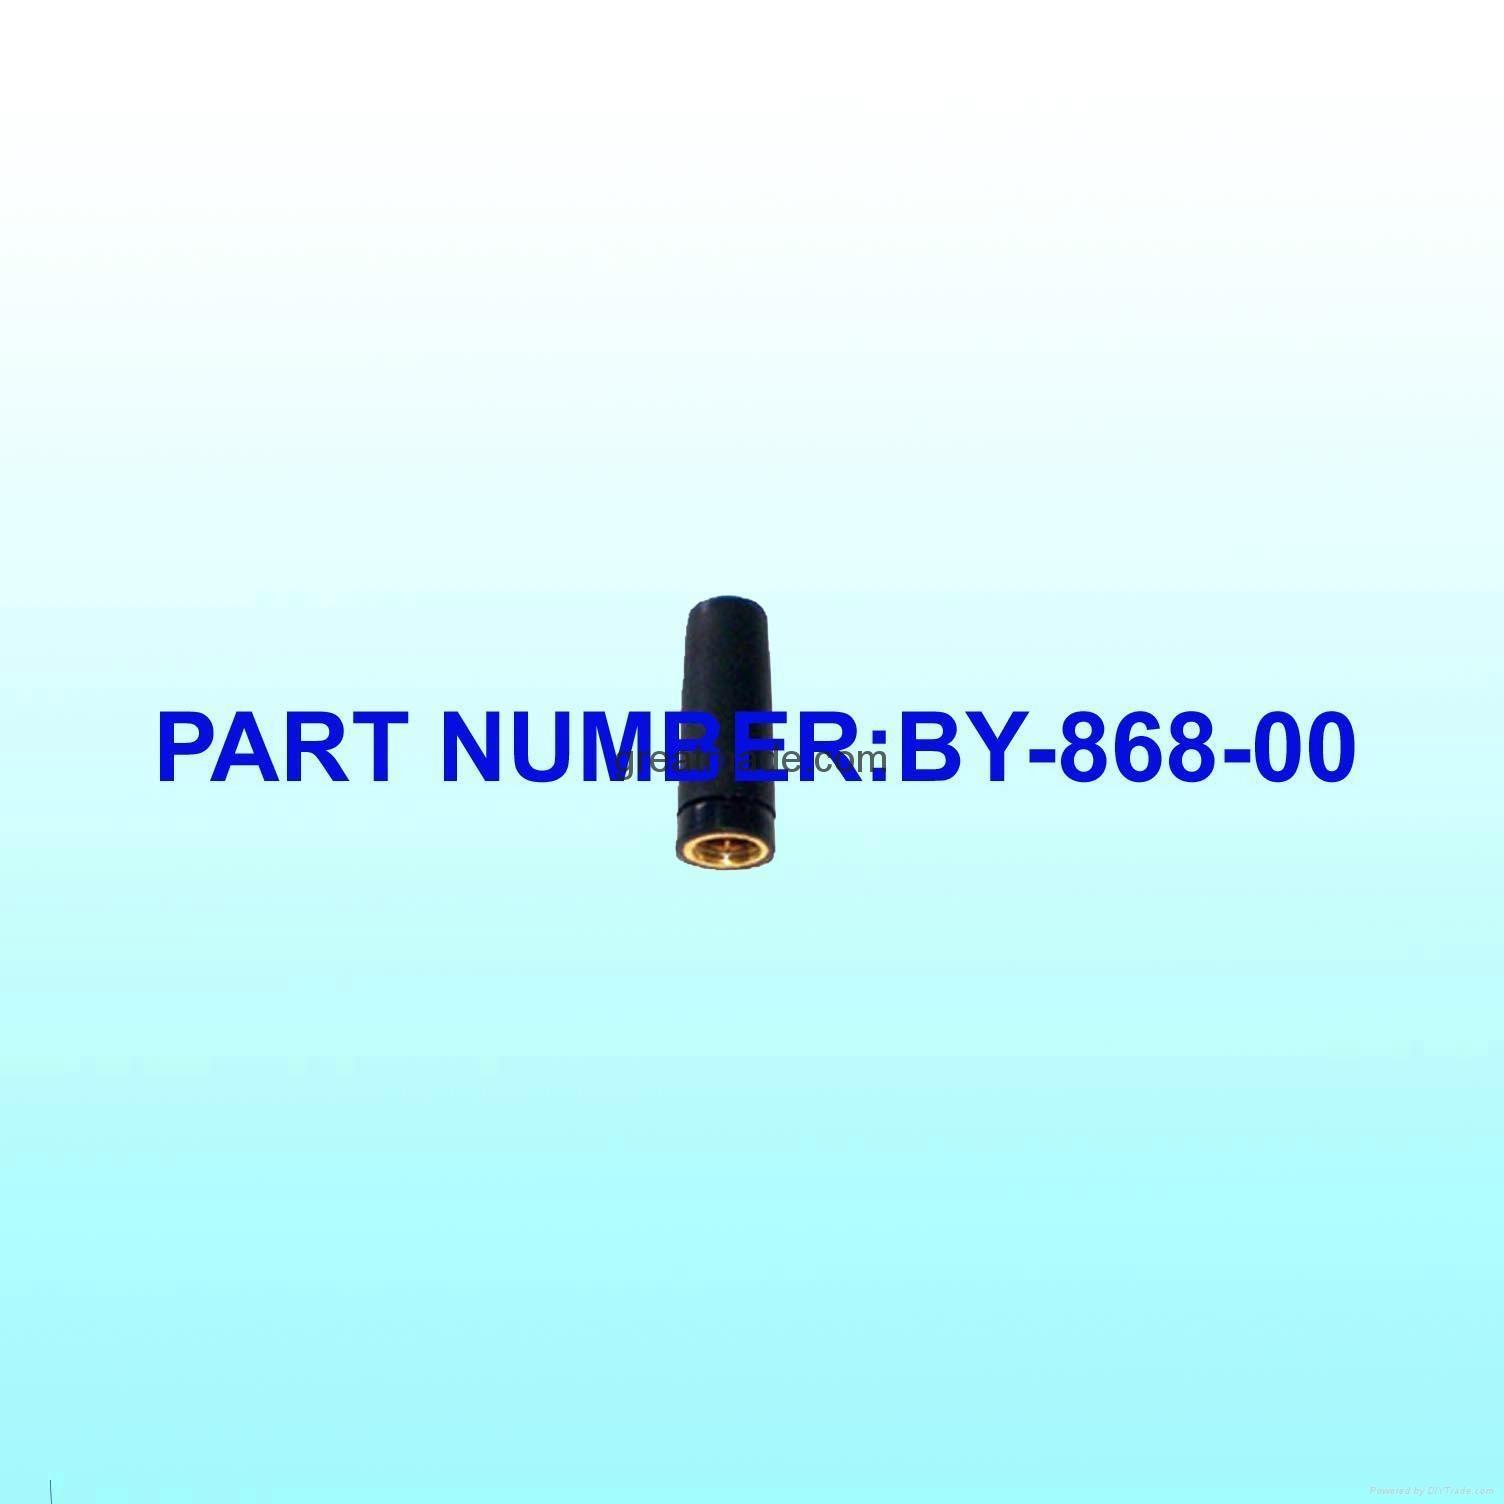 Large Adult#12 Diposable Nibp Cuff,32.1-43.4cm Arm Circumference,single tube TPU 3